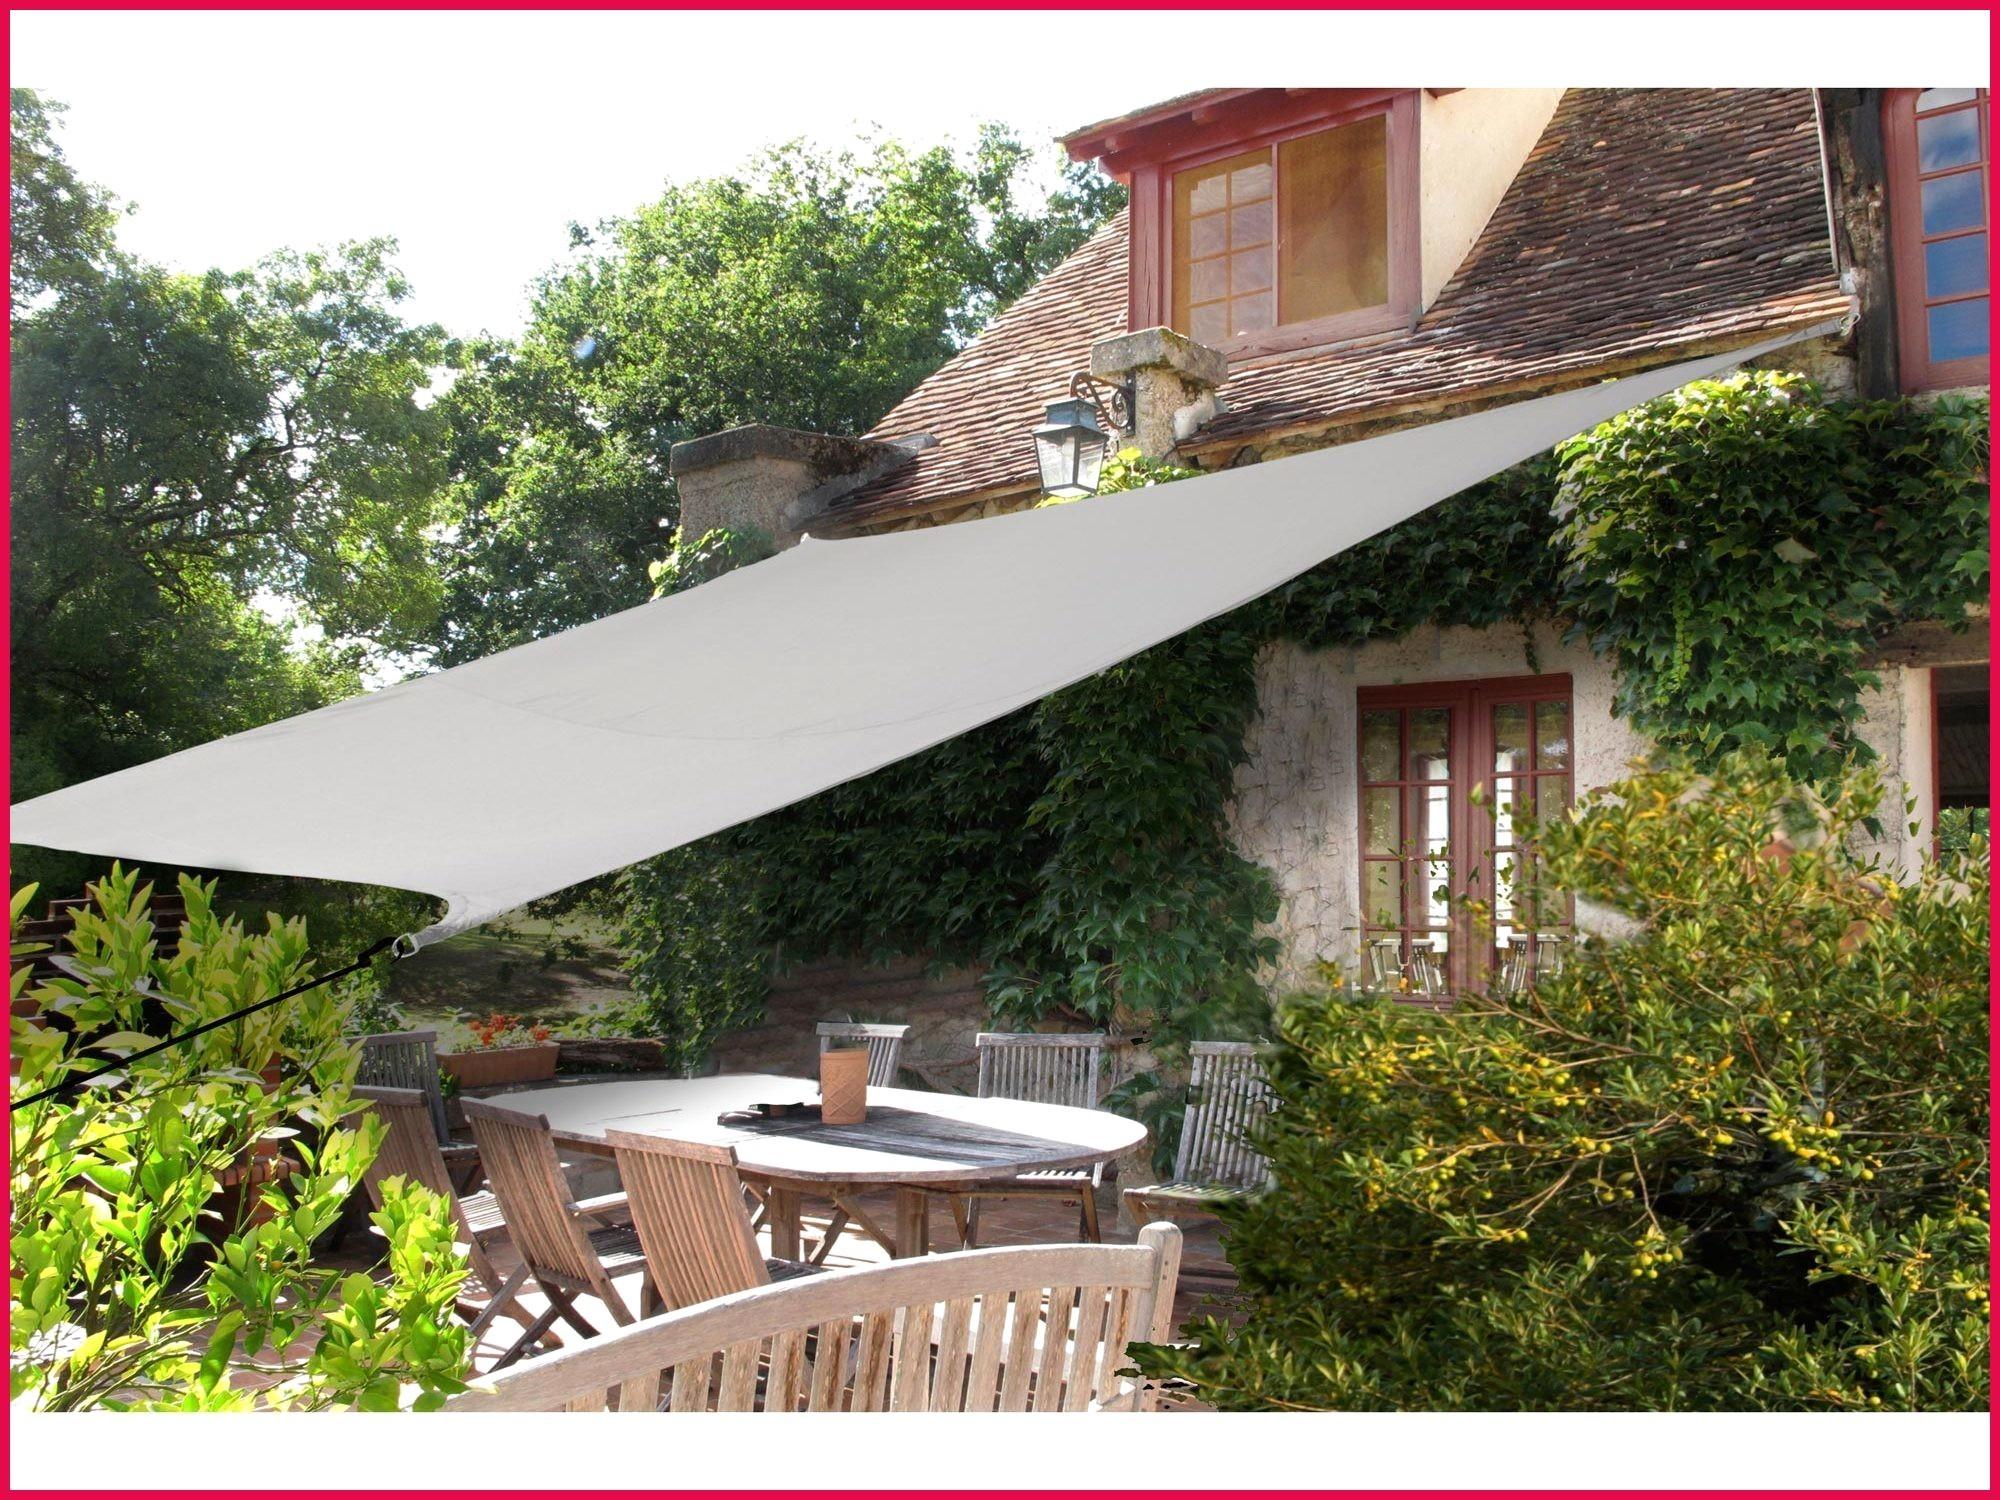 Toile Jardin Triangle Voileombrage Ikea Beau Voile Ombrage ... intérieur Toile Jardin Triangle